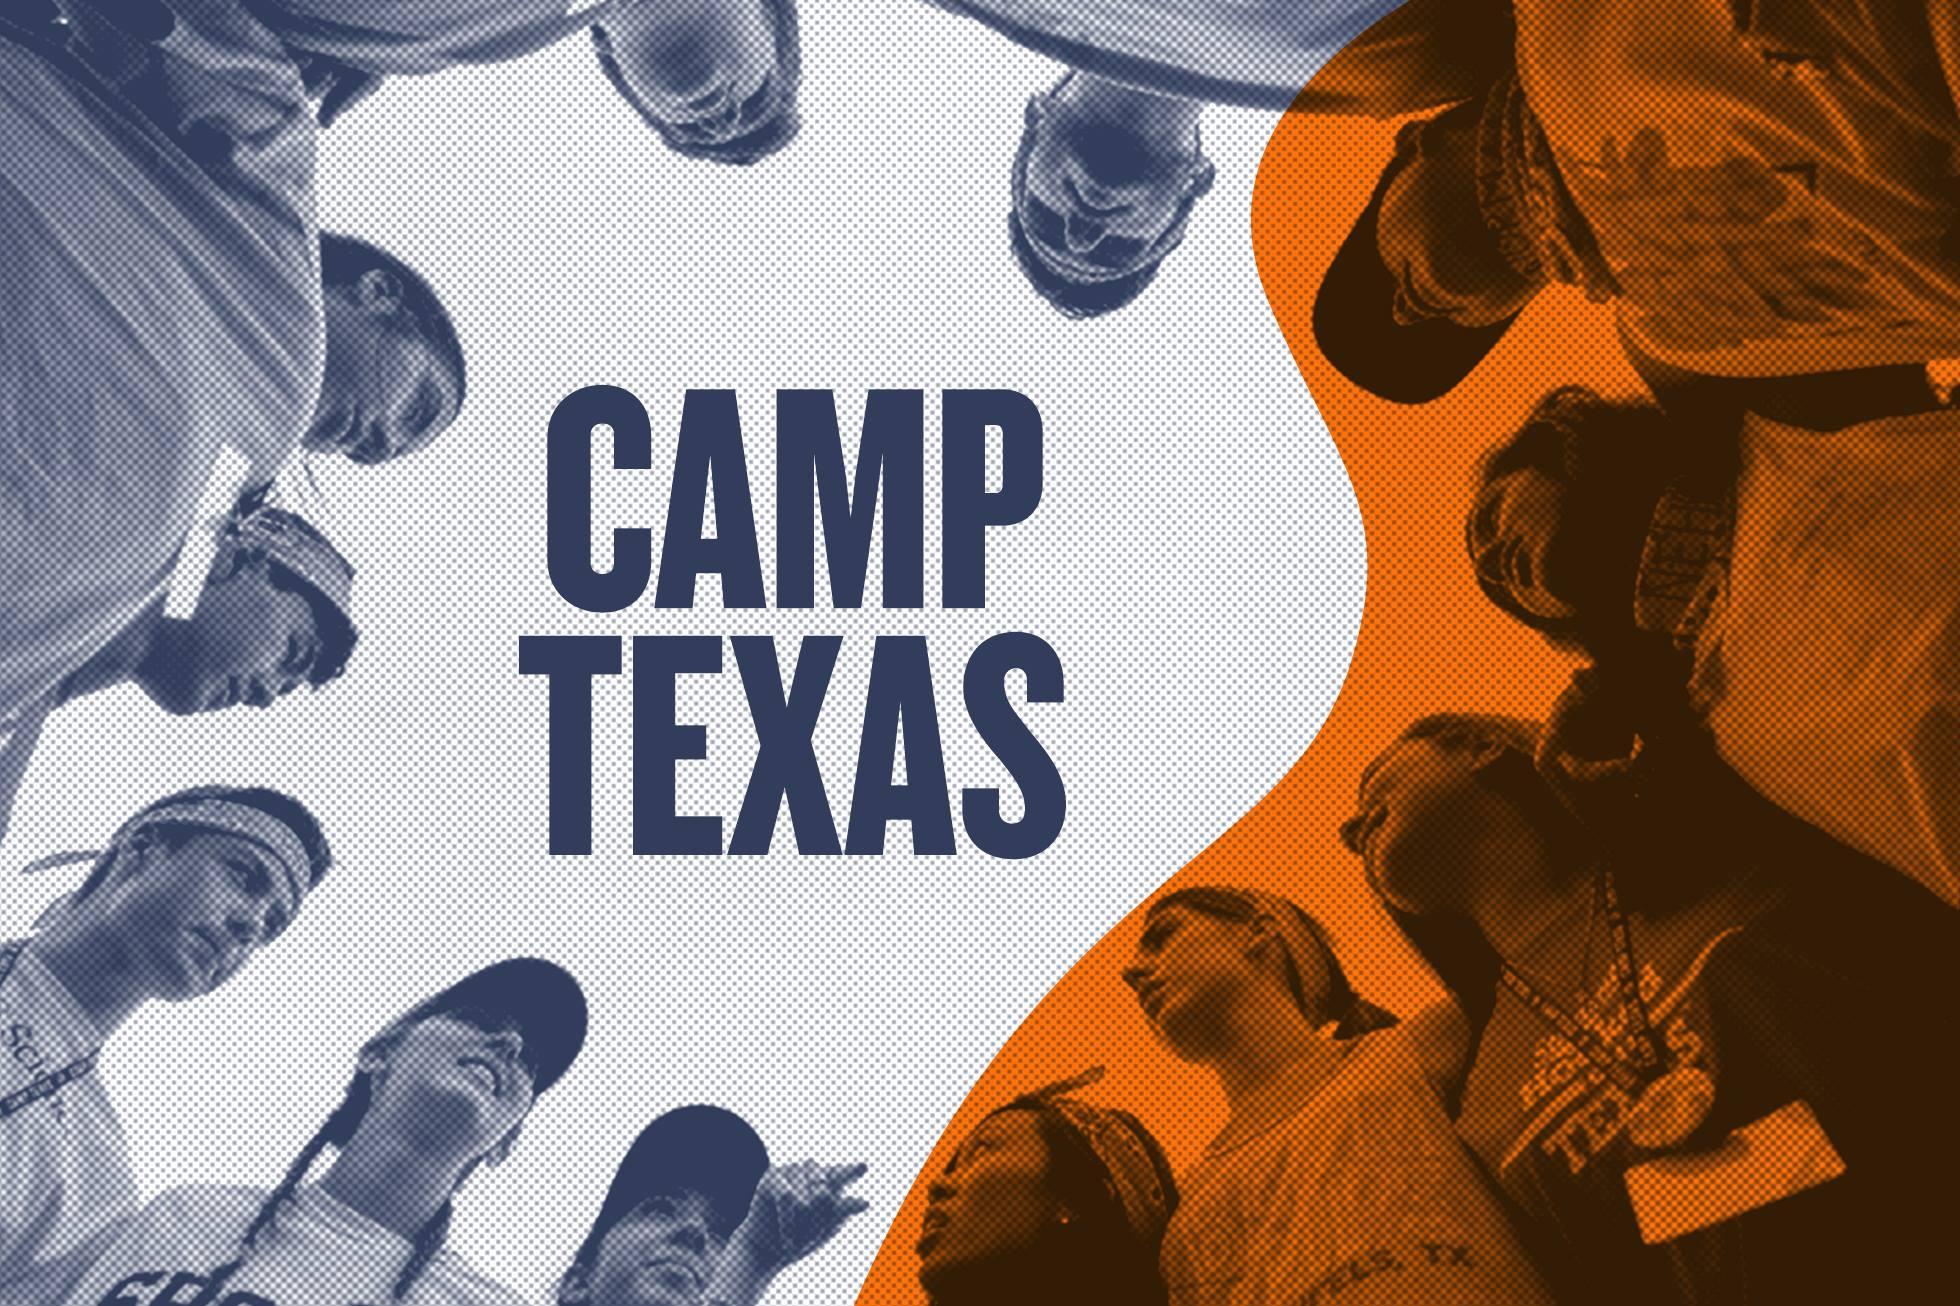 Mt Sac Spring 2020 Registration.2020 Spring Camp Texas Texas Exes